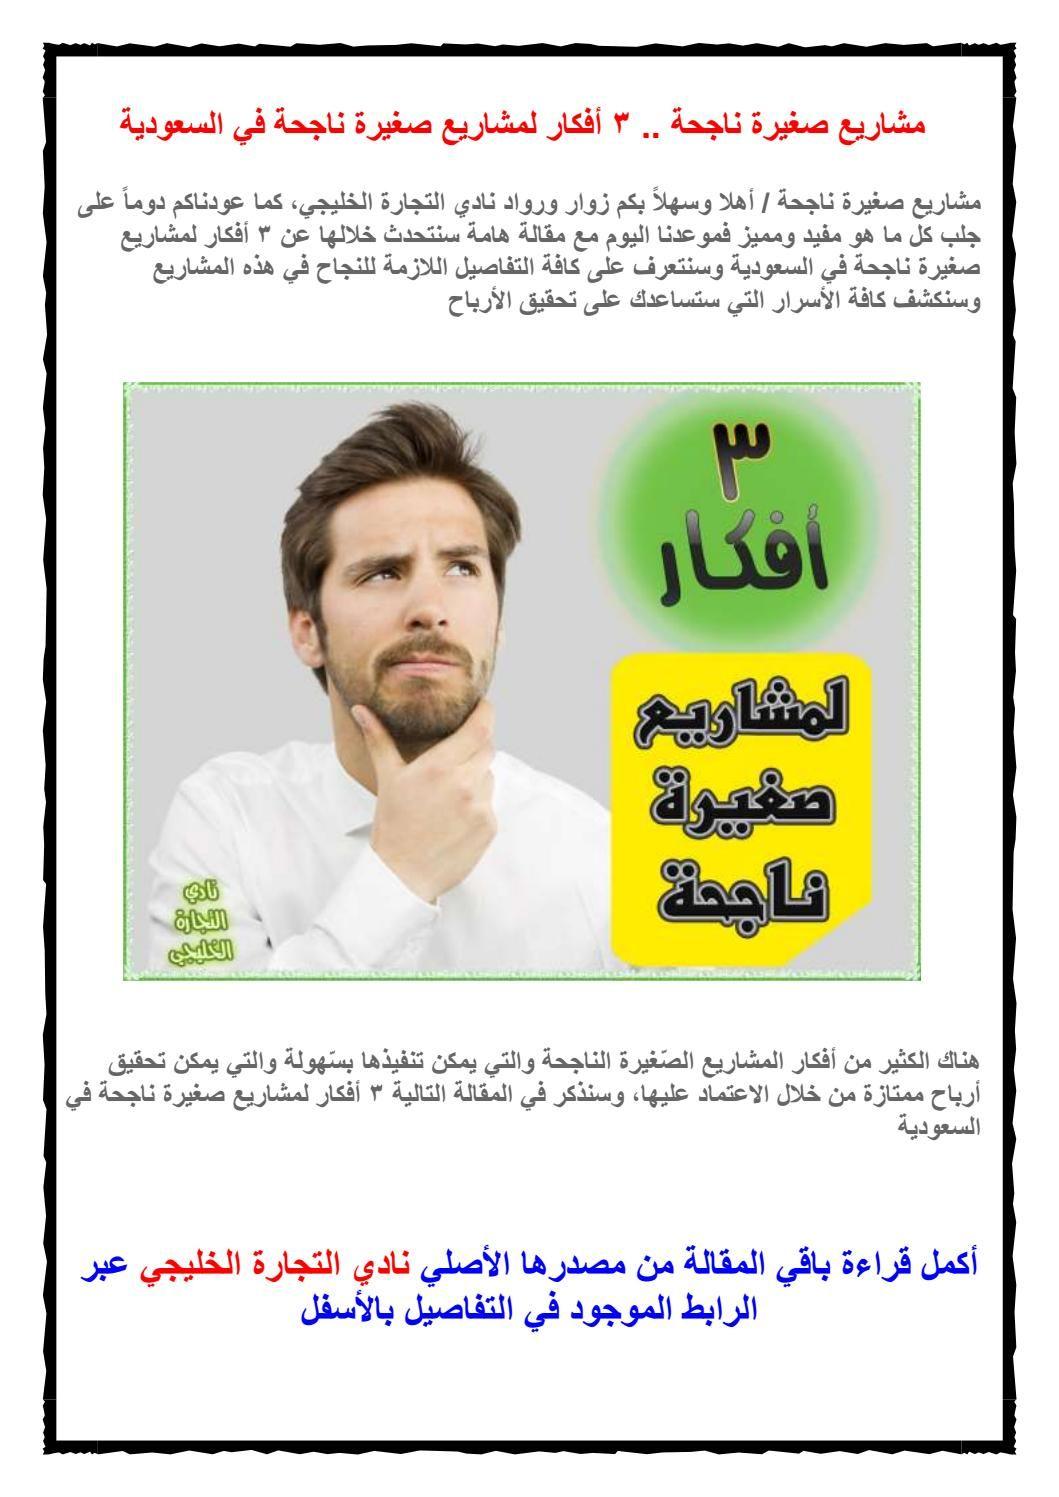 مشاريع صغيرة ناجحة 3 أفكار لمشاريع صغيرة ناجحة في السعودية Microsoft Word Document Words Incoming Call Screenshot